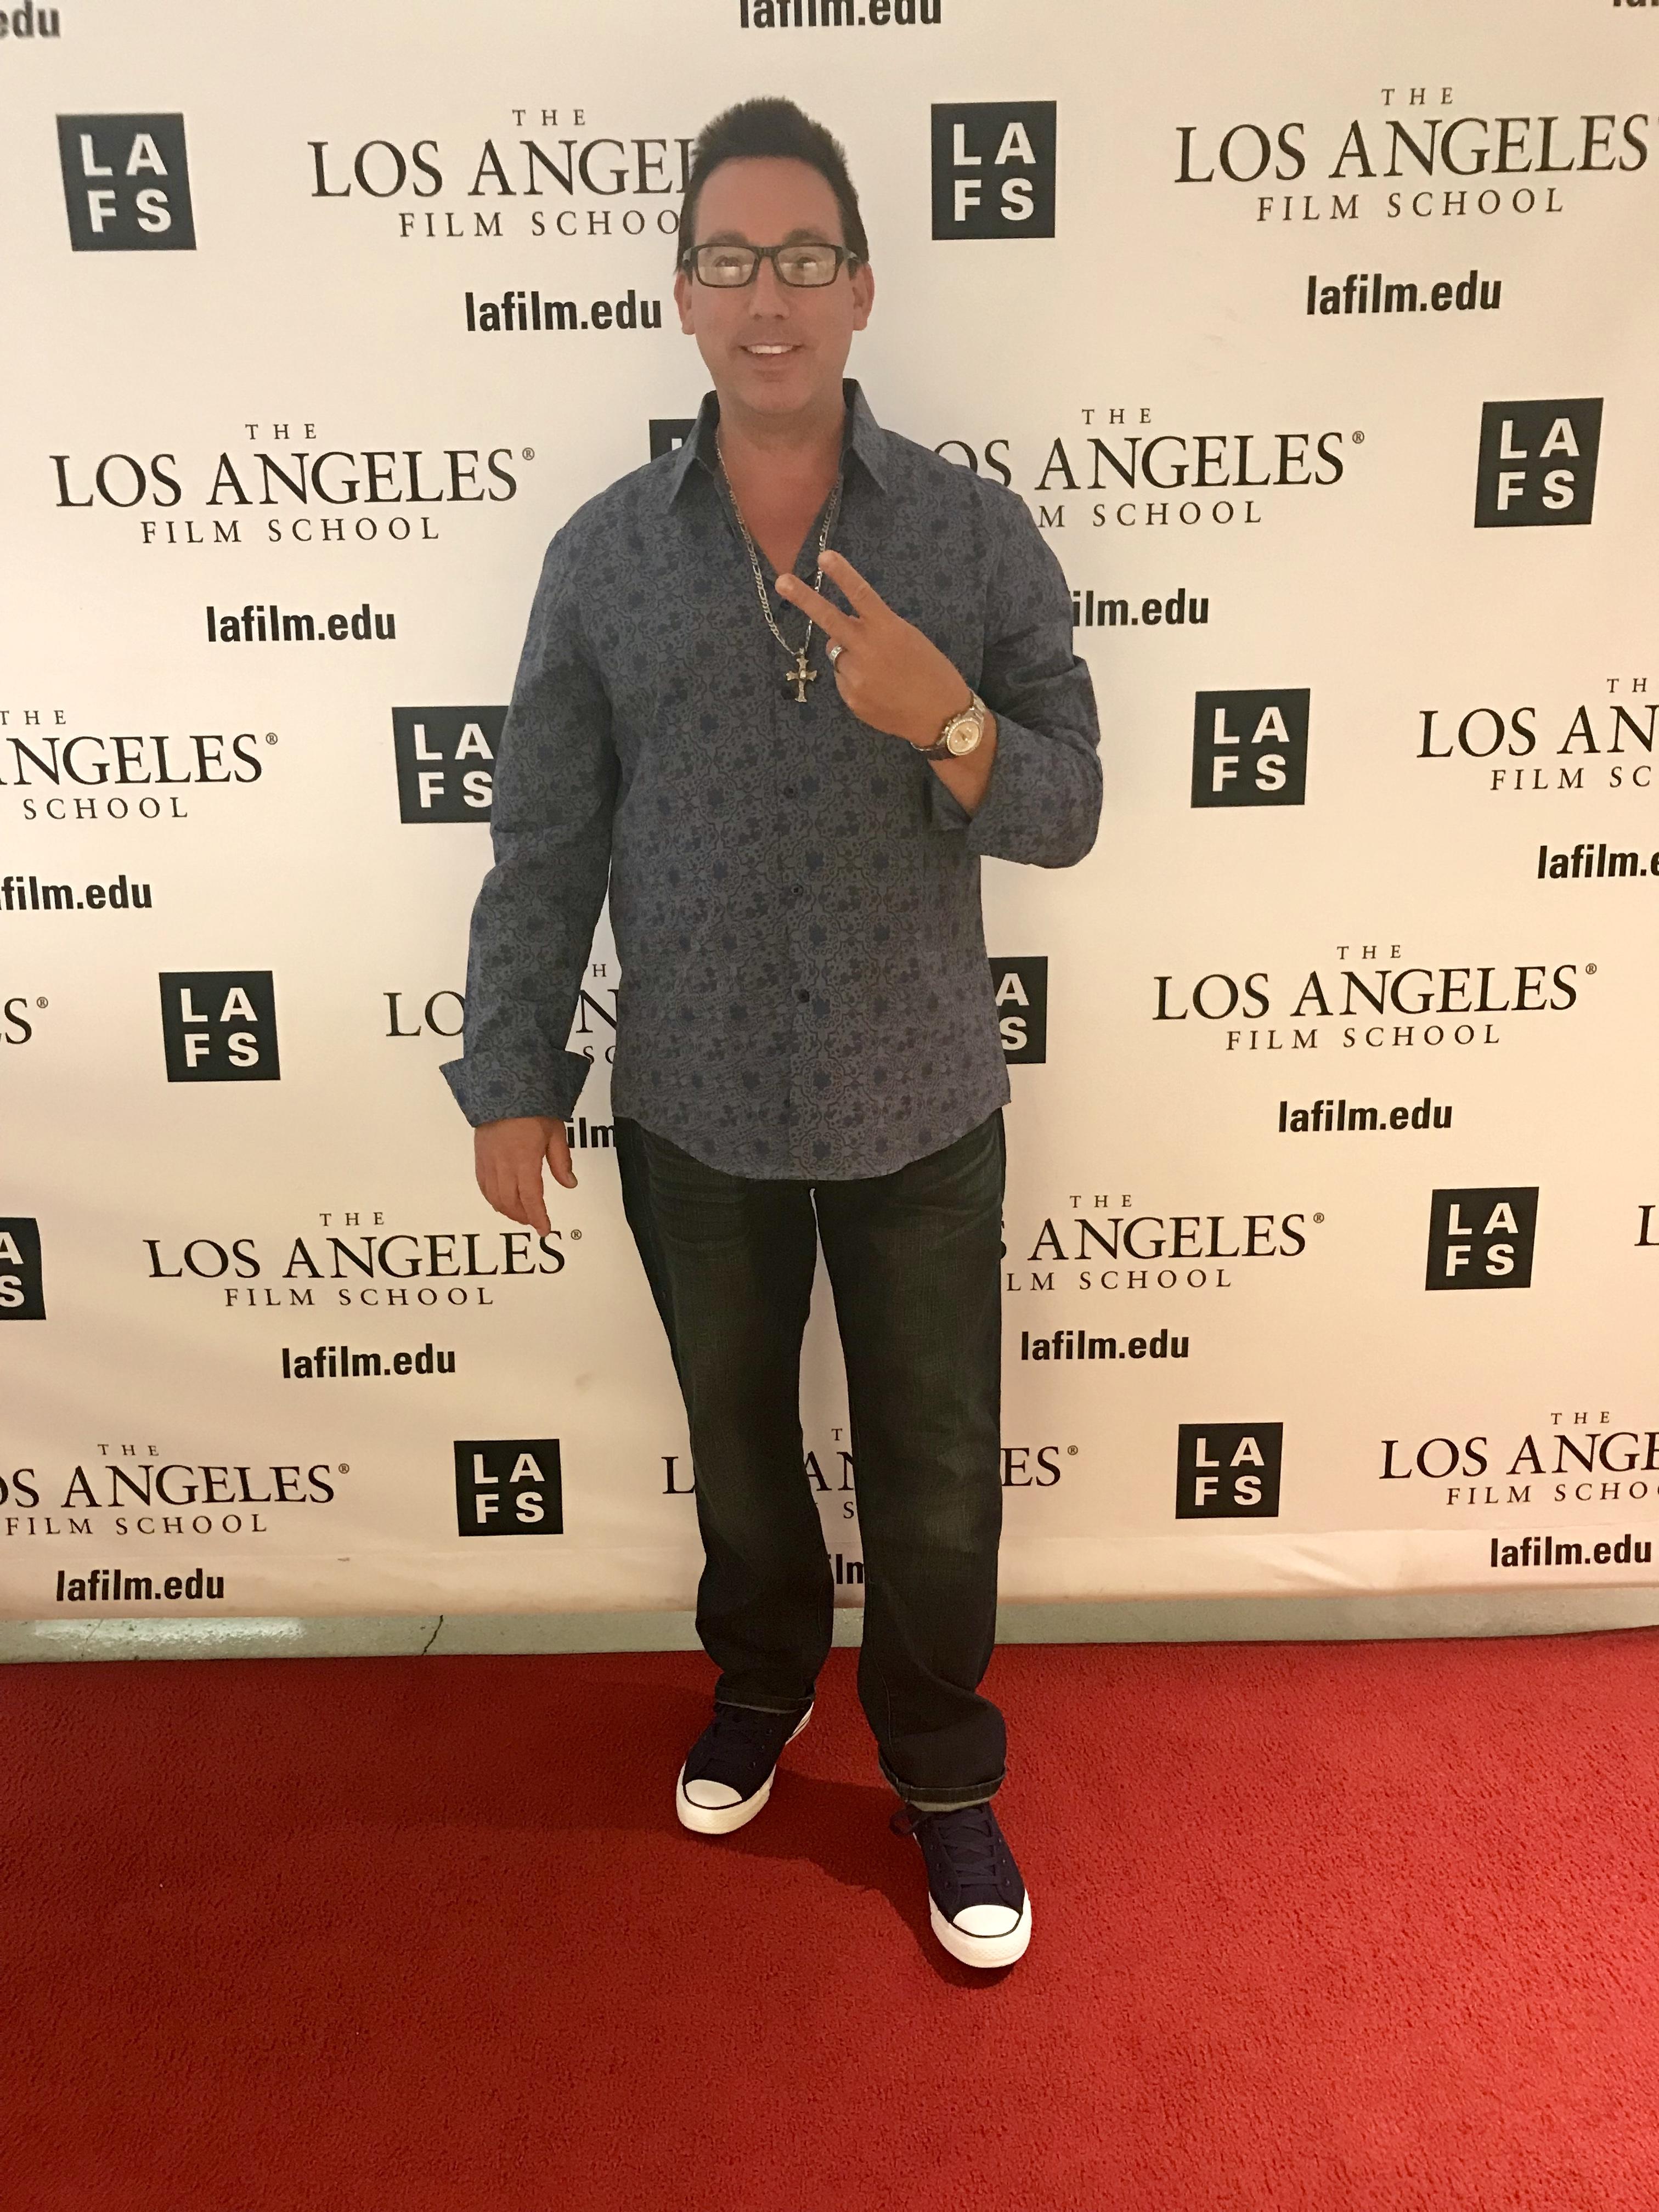 Mike Breyer at Los Angeles Film School for Enipheres.